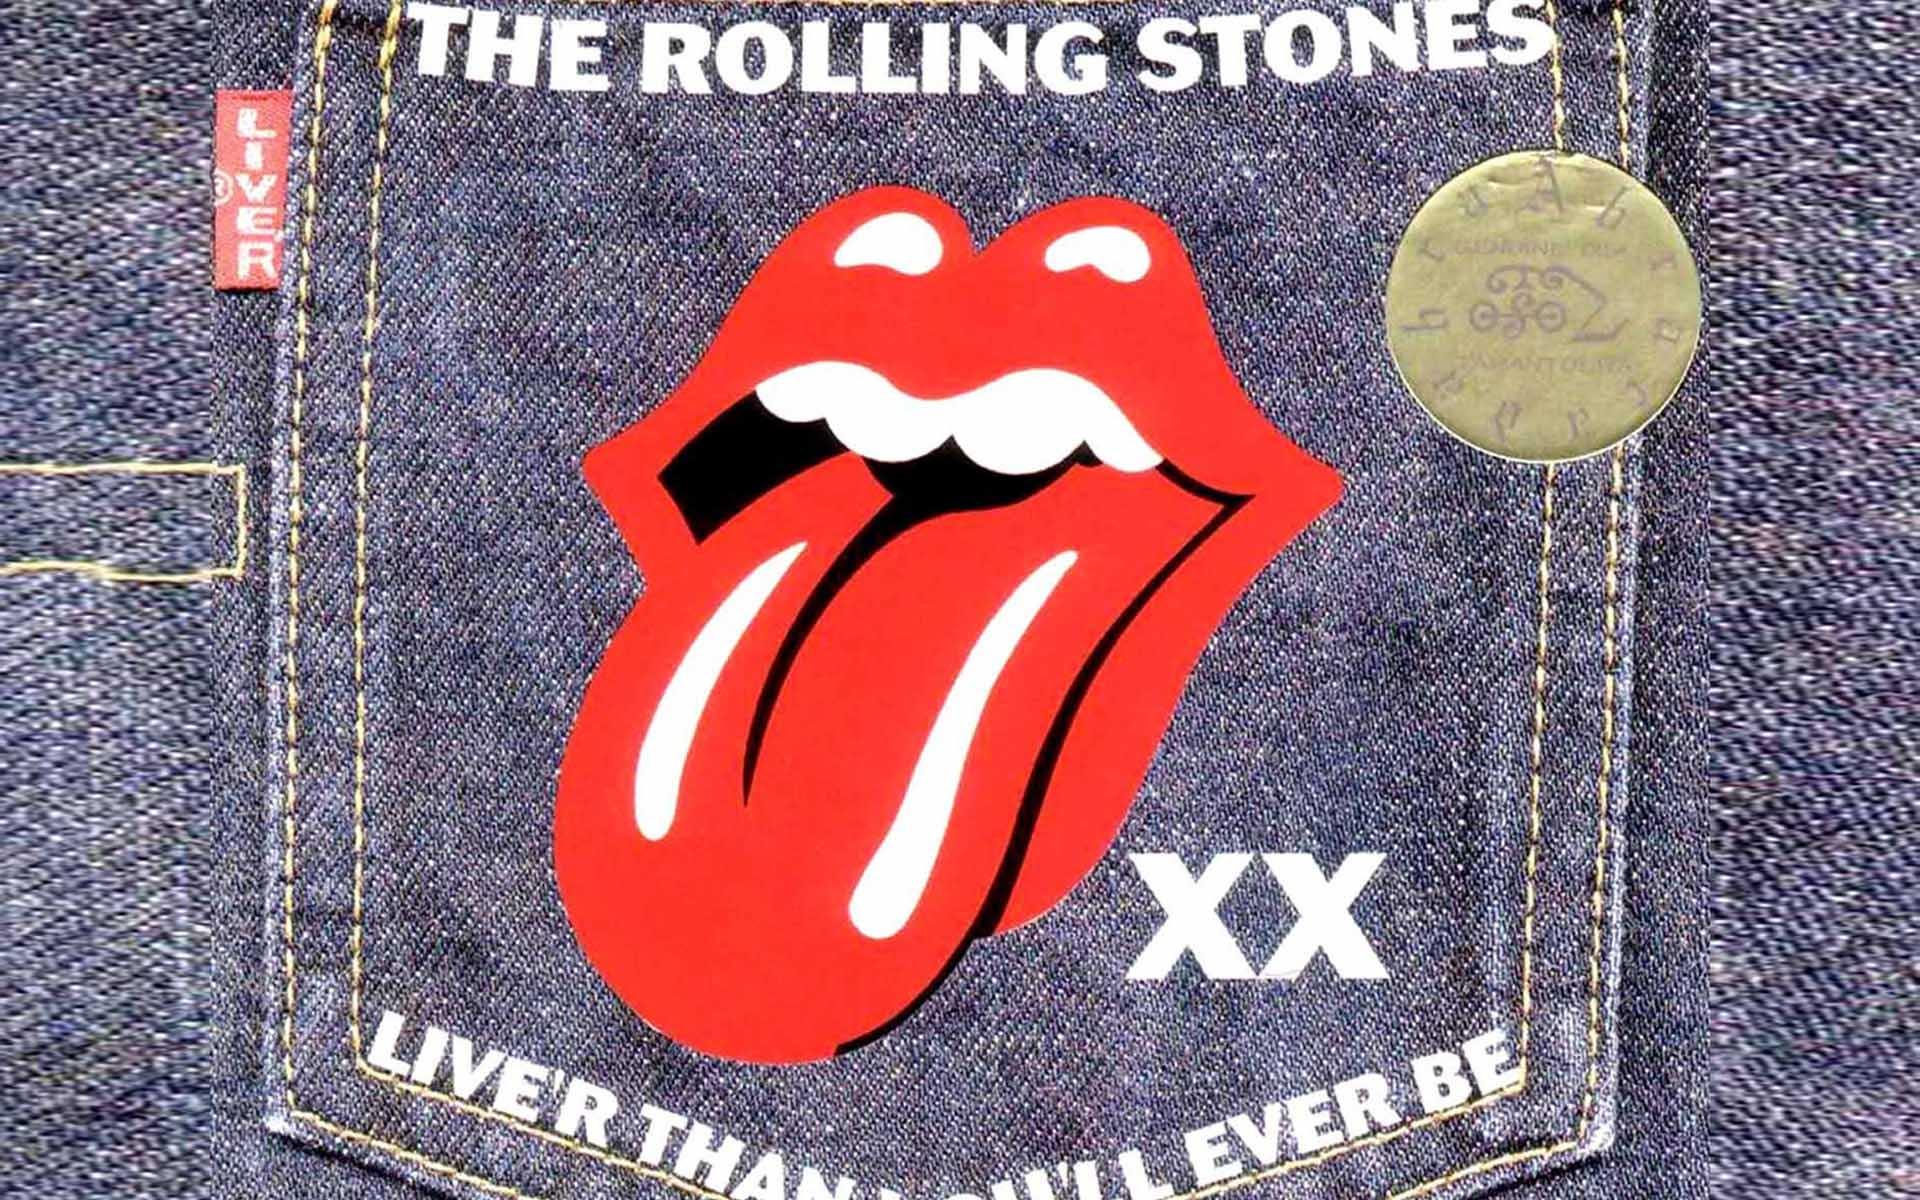 The Rolling Stones Widescreen Wallpaper